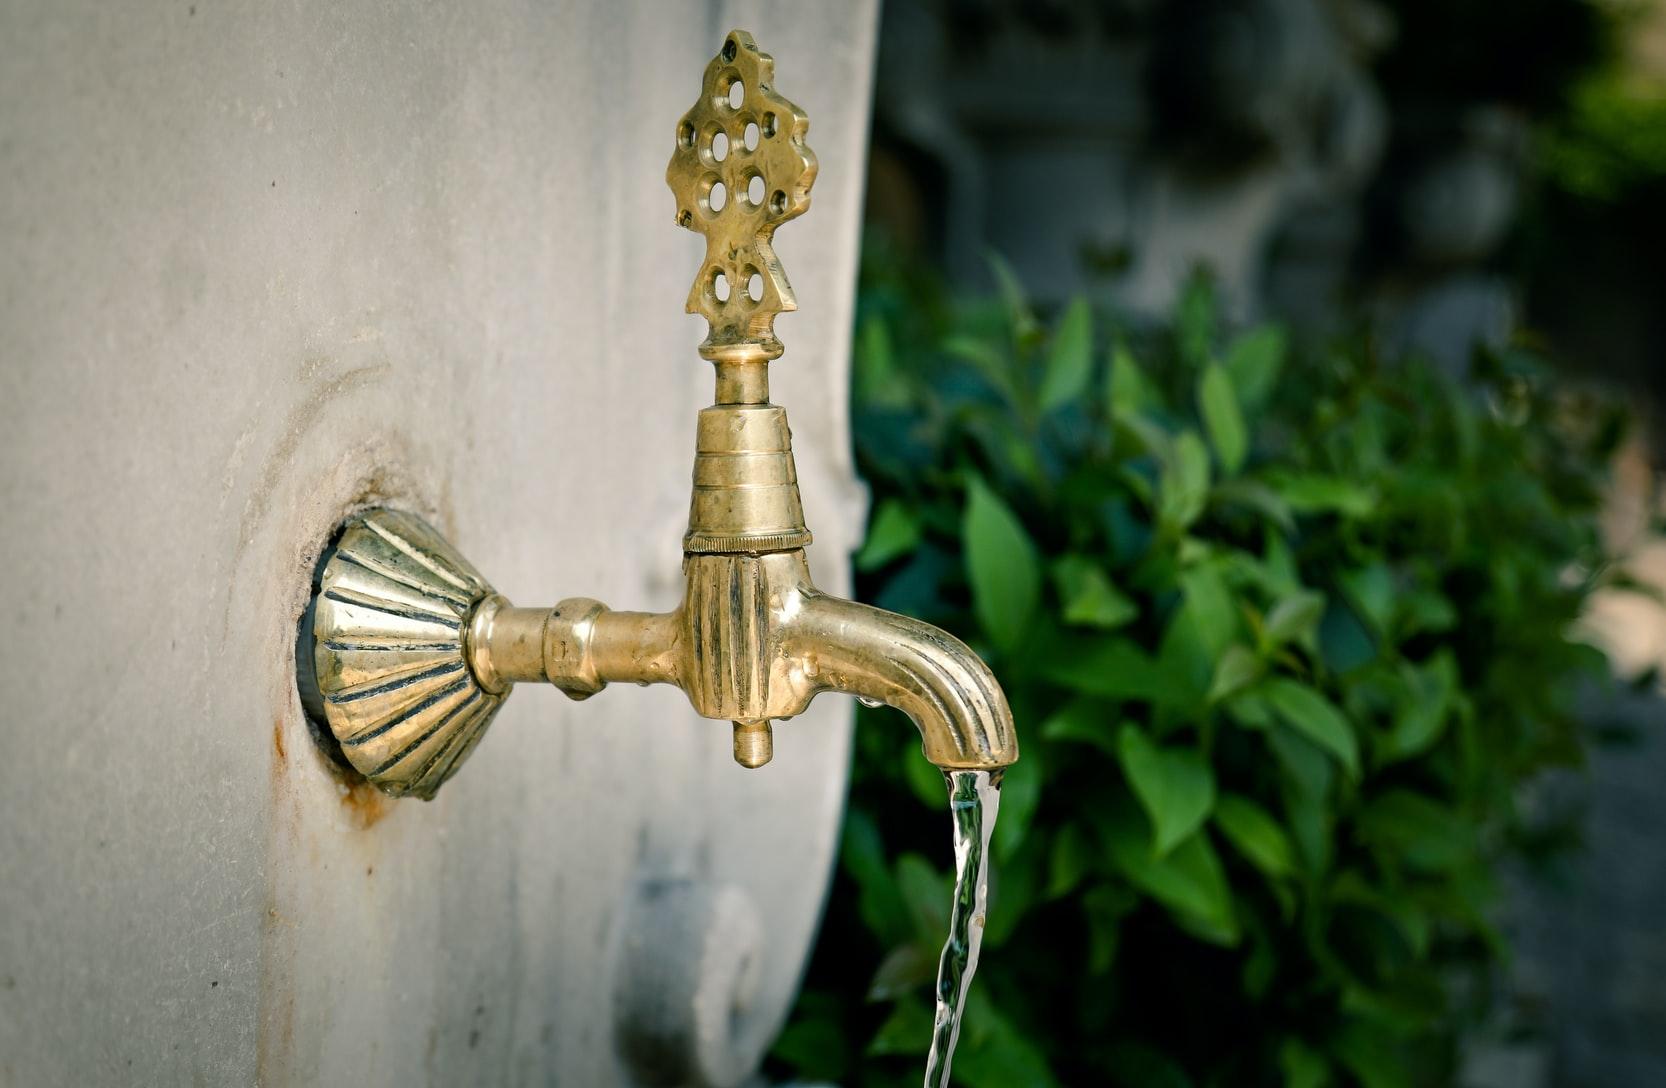 Long Beach Water Damage Restoration Company